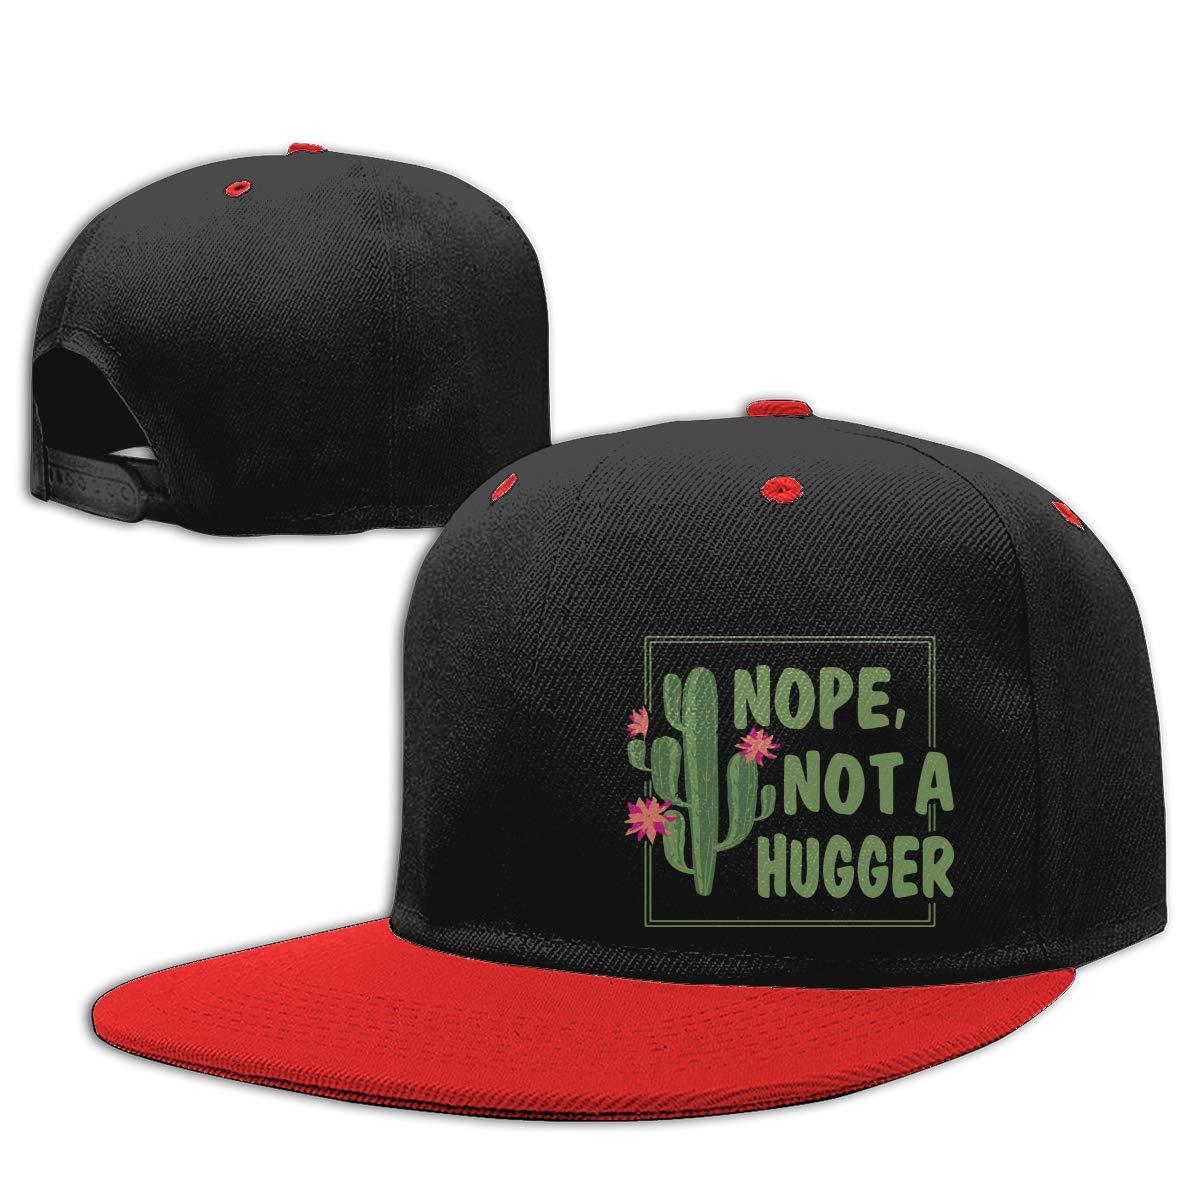 Men Womens Trucker Cap Nope Not A Hugger Adjustable Hip-Hop Baseball Caps